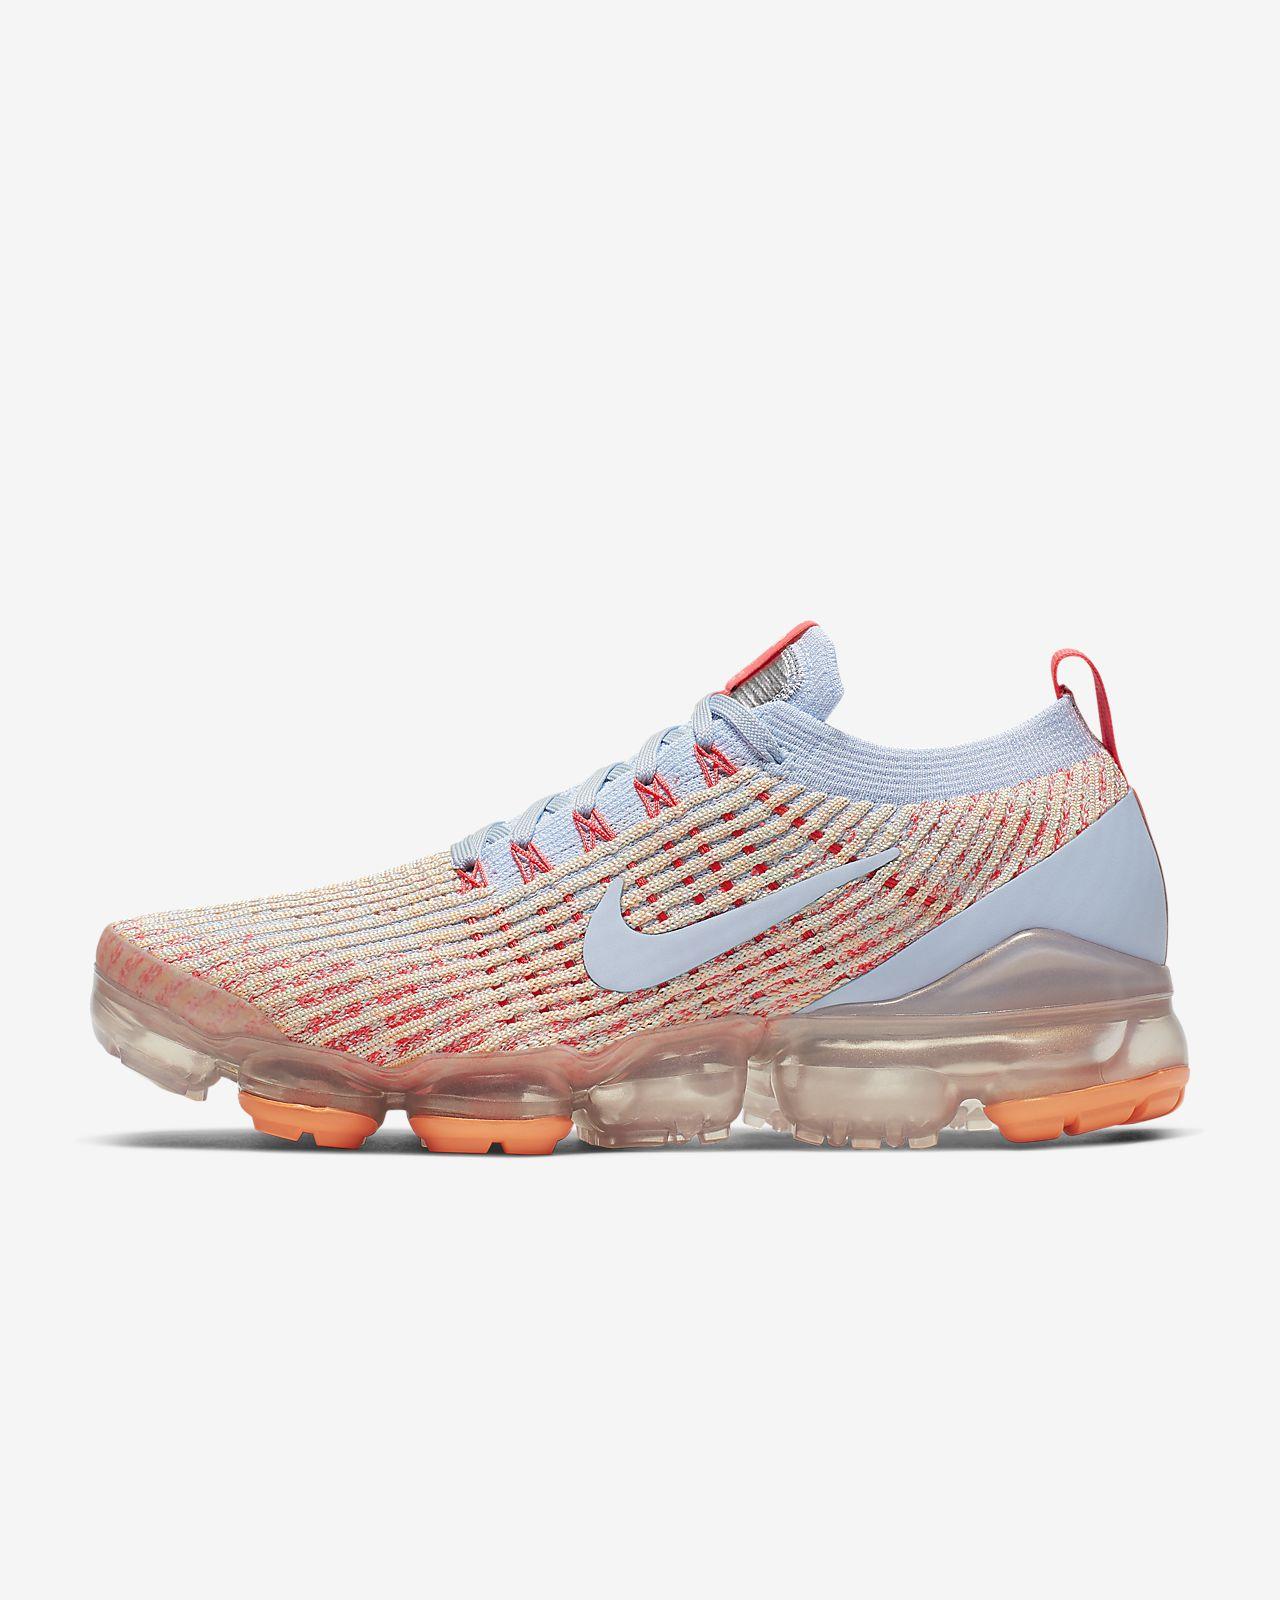 2019 Nike Air VaporMax 3.0 Shoes Multi Color For Sale